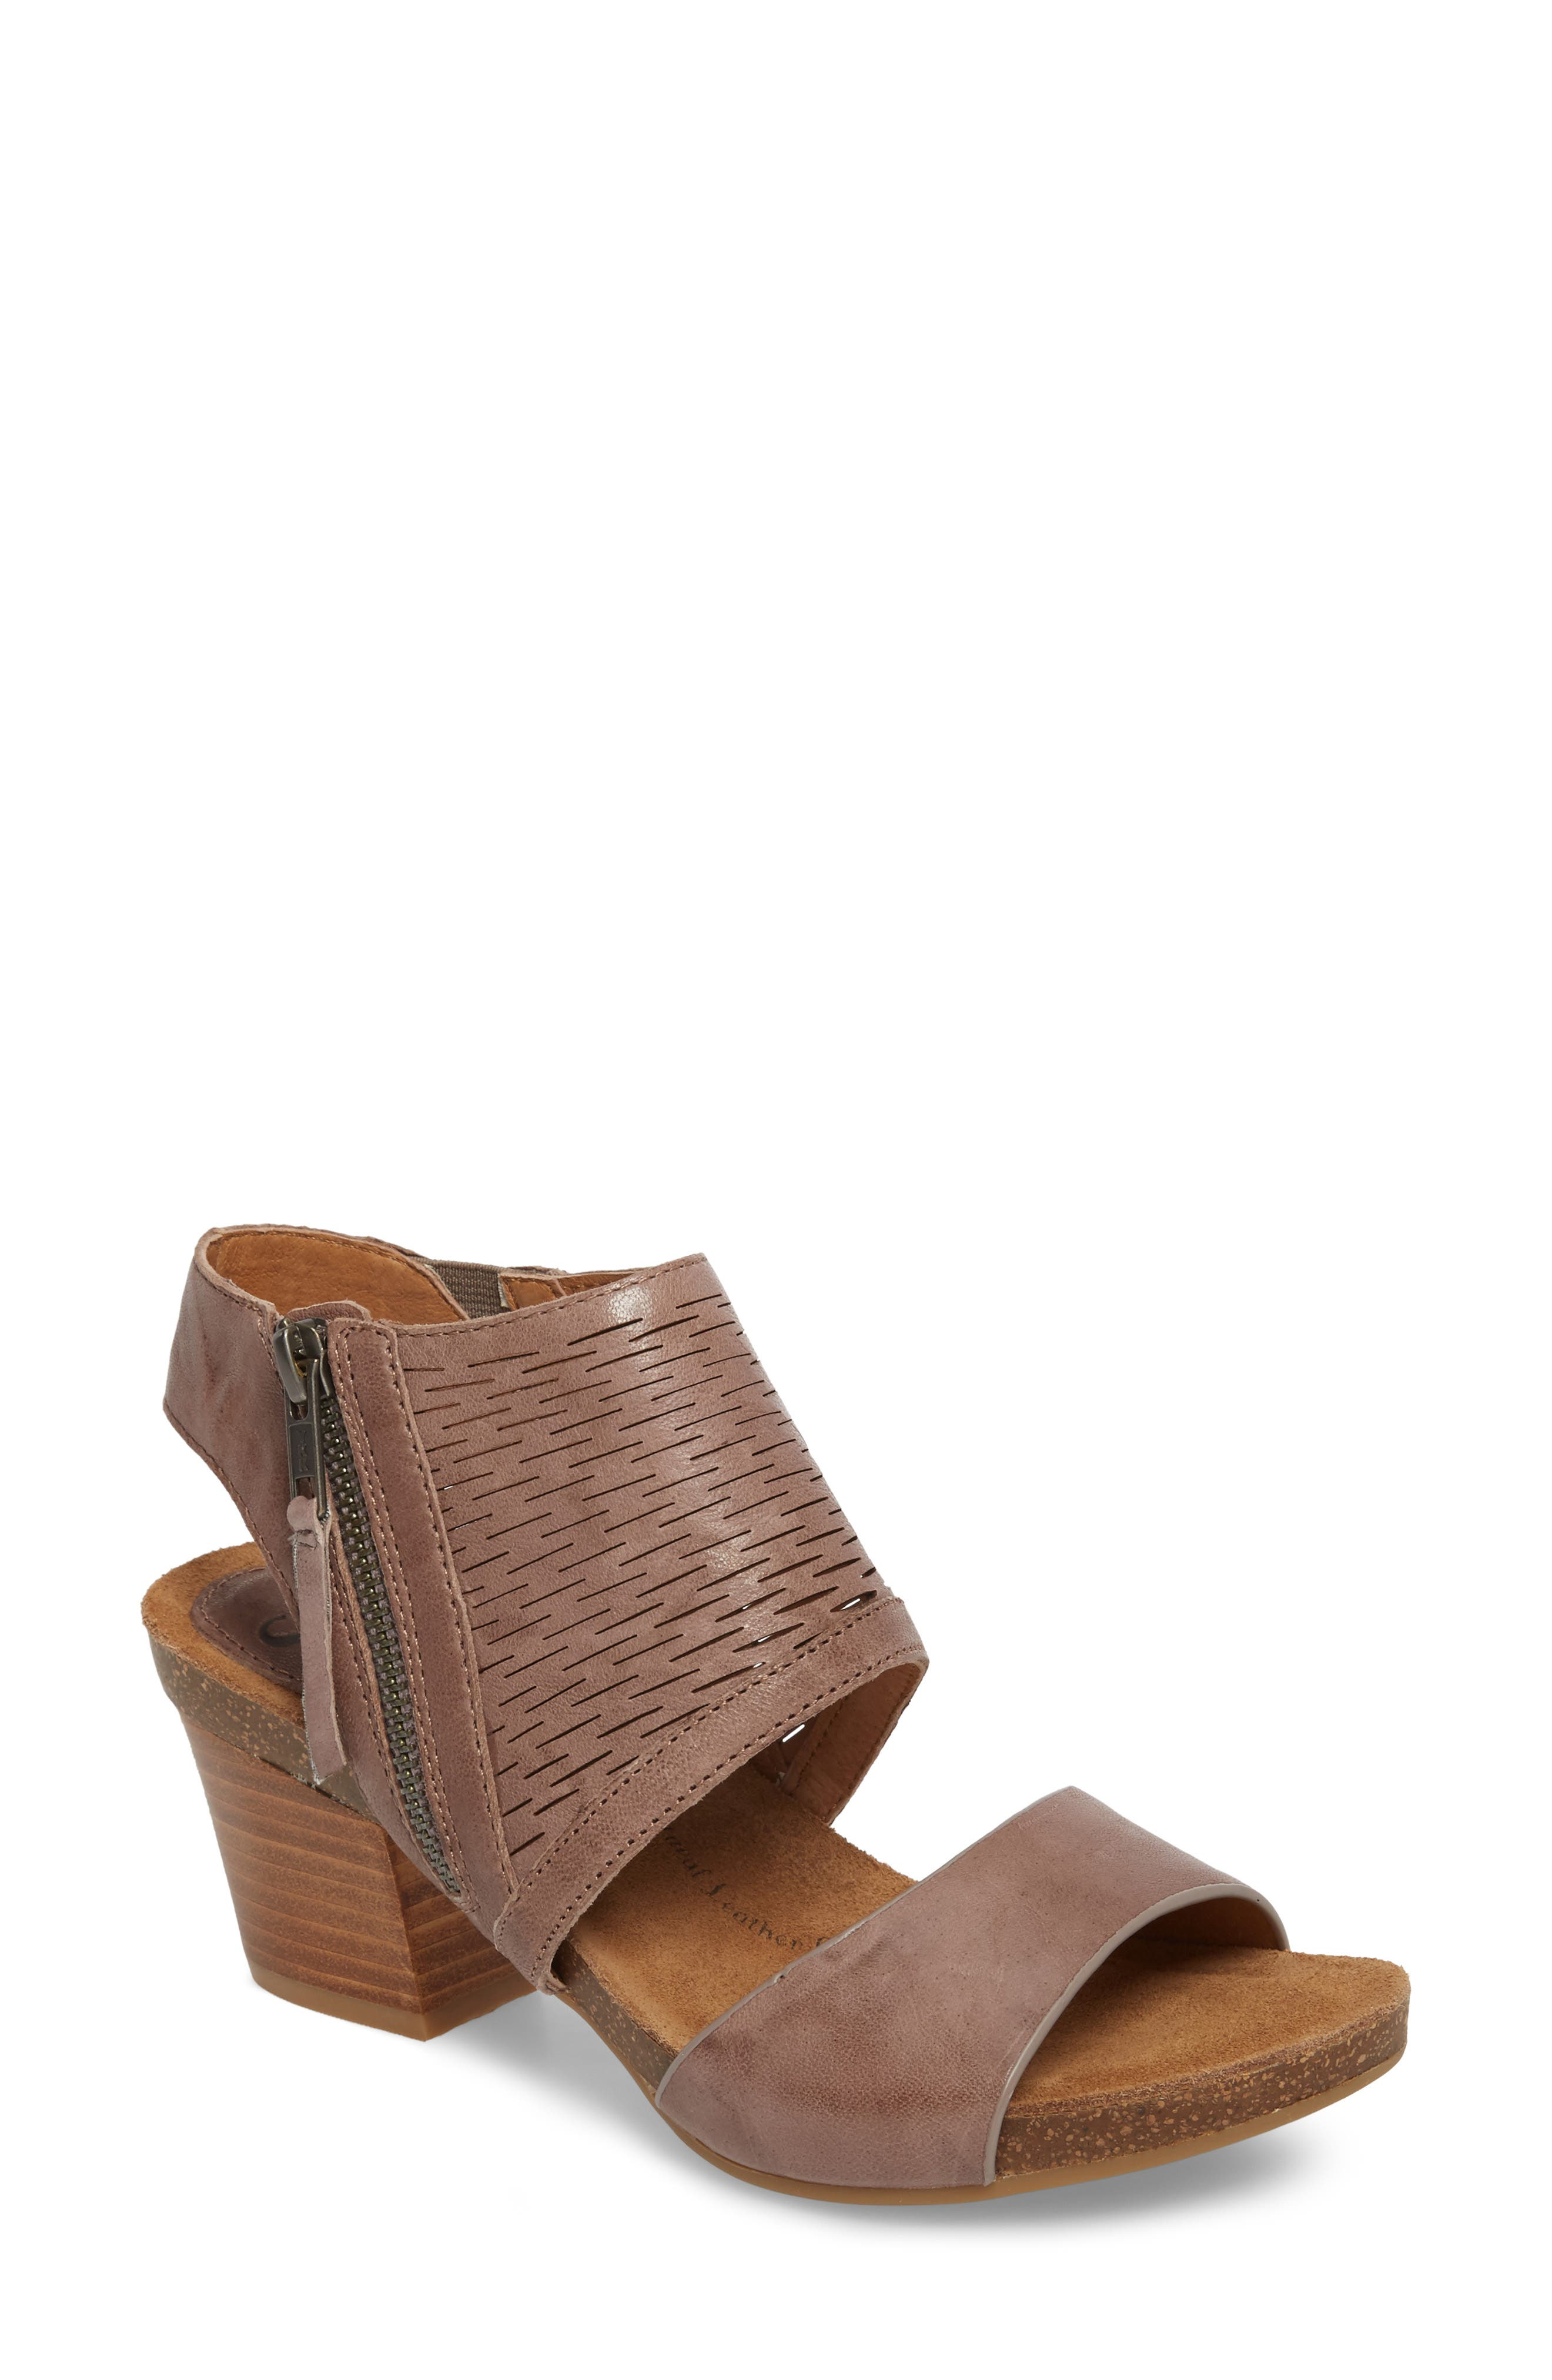 Alternate Image 1 Selected - Söfft Milan Block Heel Sandal (Women)